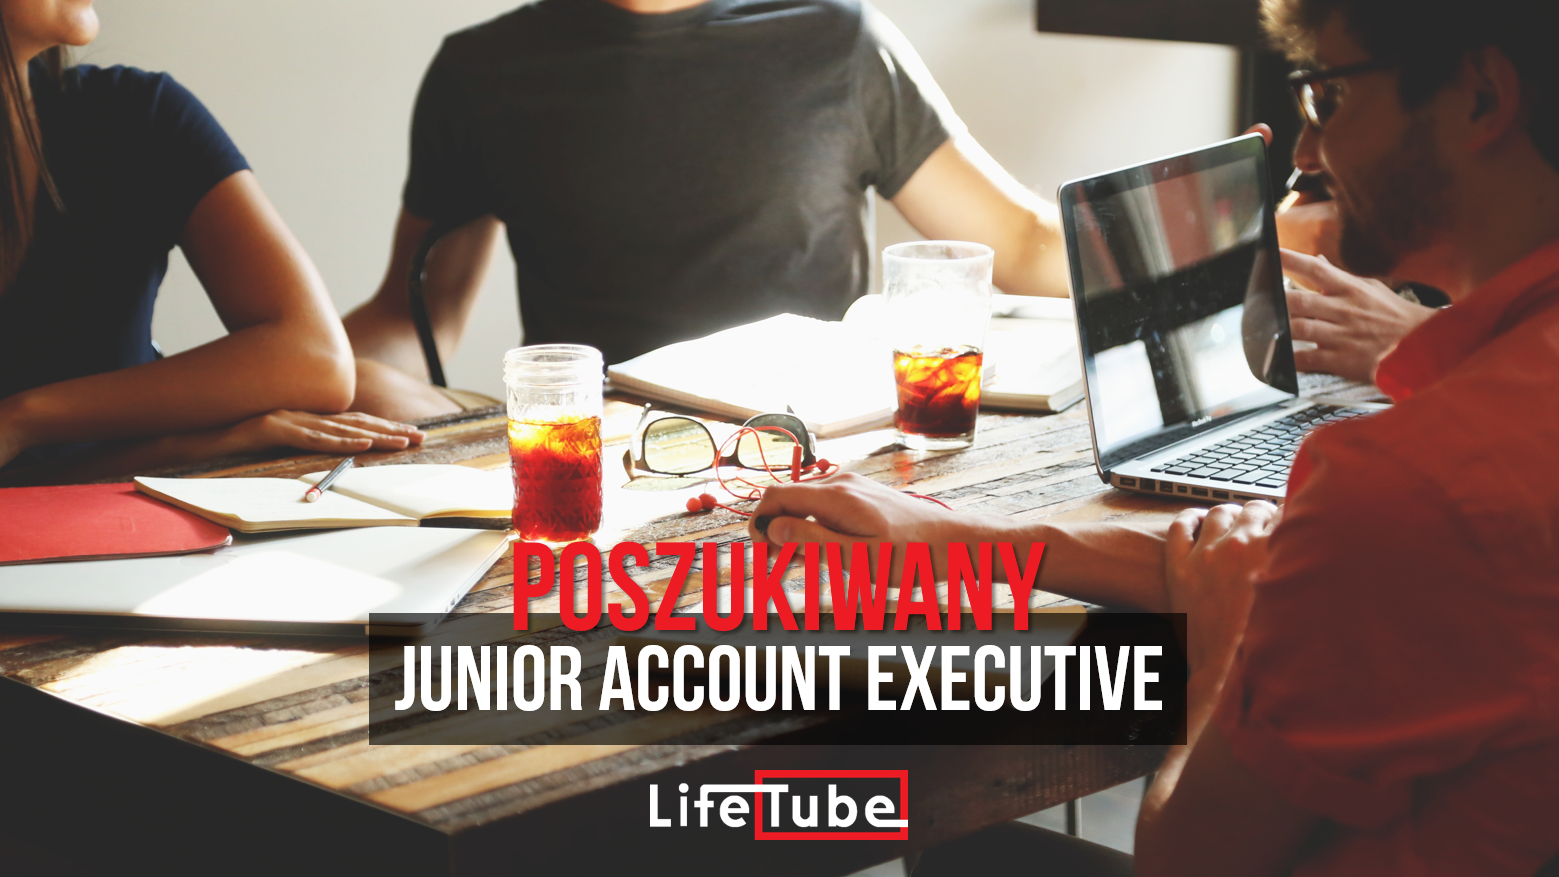 Zostań Junior Account Executive w LifeTube!